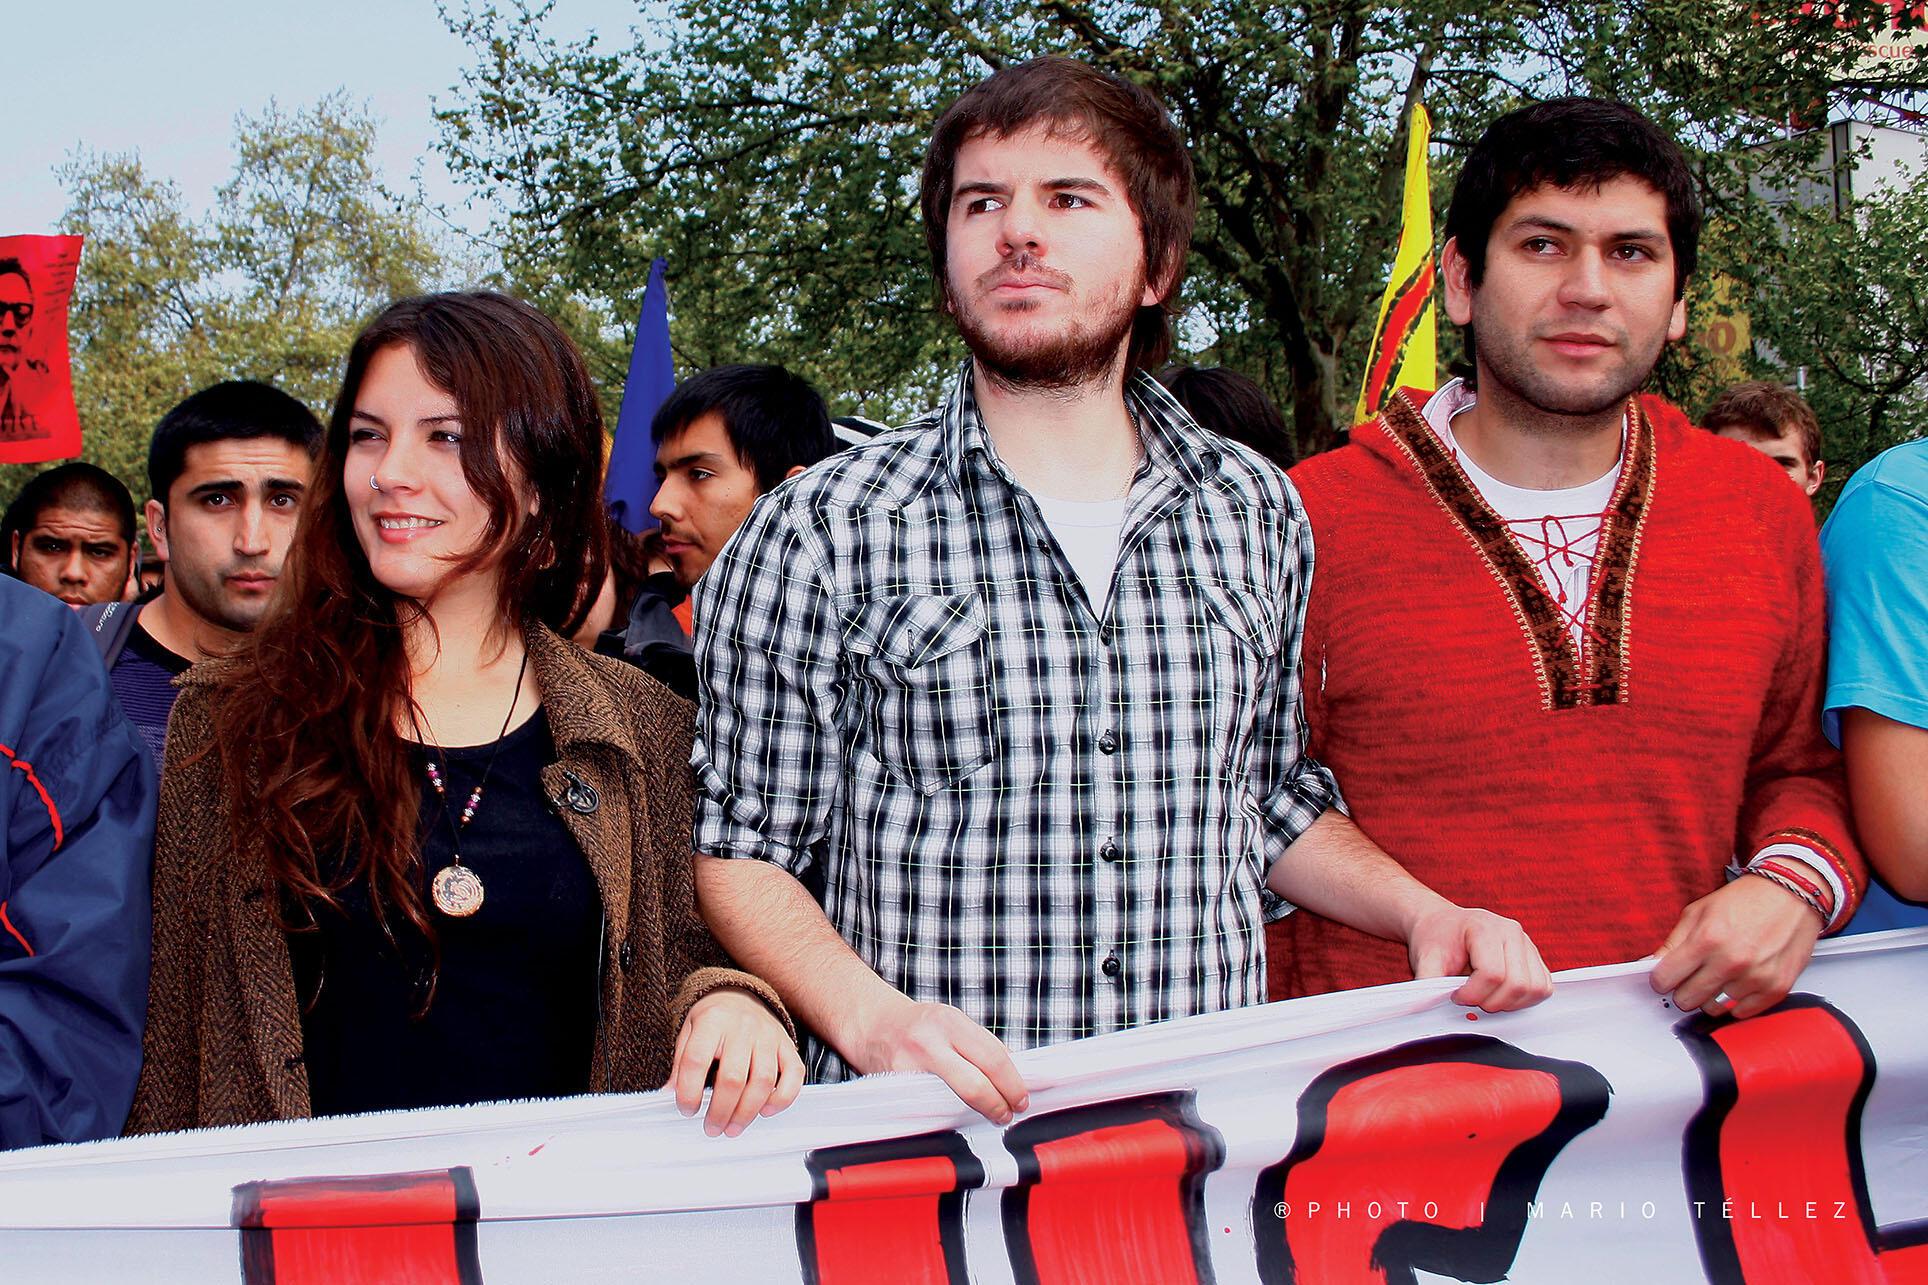 Camila Vallejo, Giorgio Jackson, and Camilo Ballesteros, September 2011. (Photo by Mario Tellez Cardemil.)